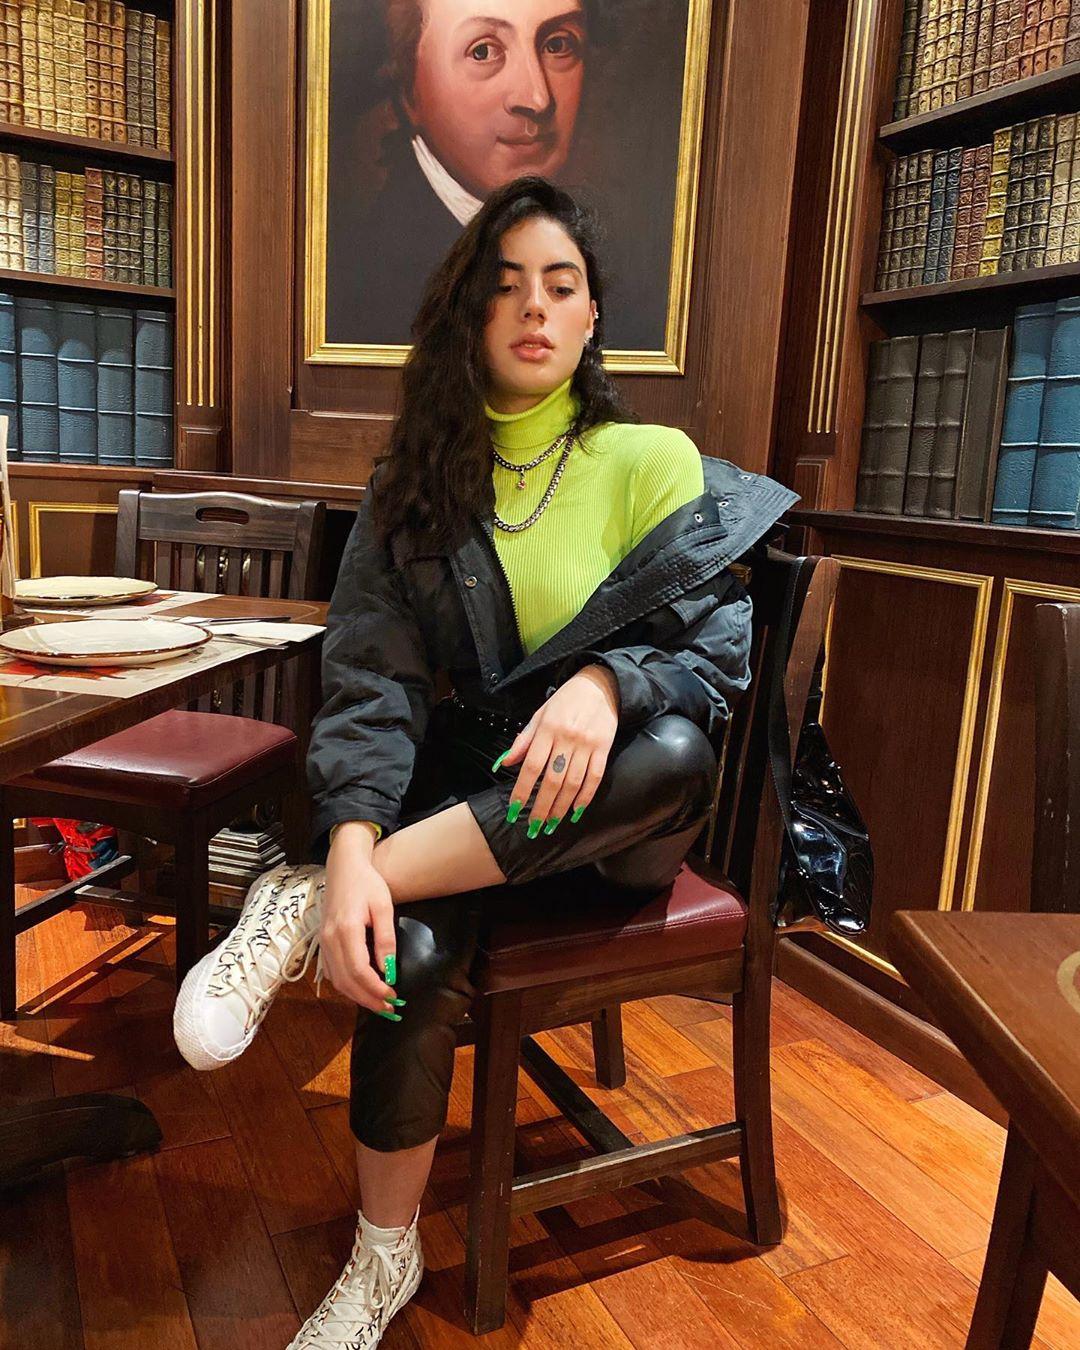 Paulina-Franco-Lopez-Wallpapers-Insta-Fit-BIo-11